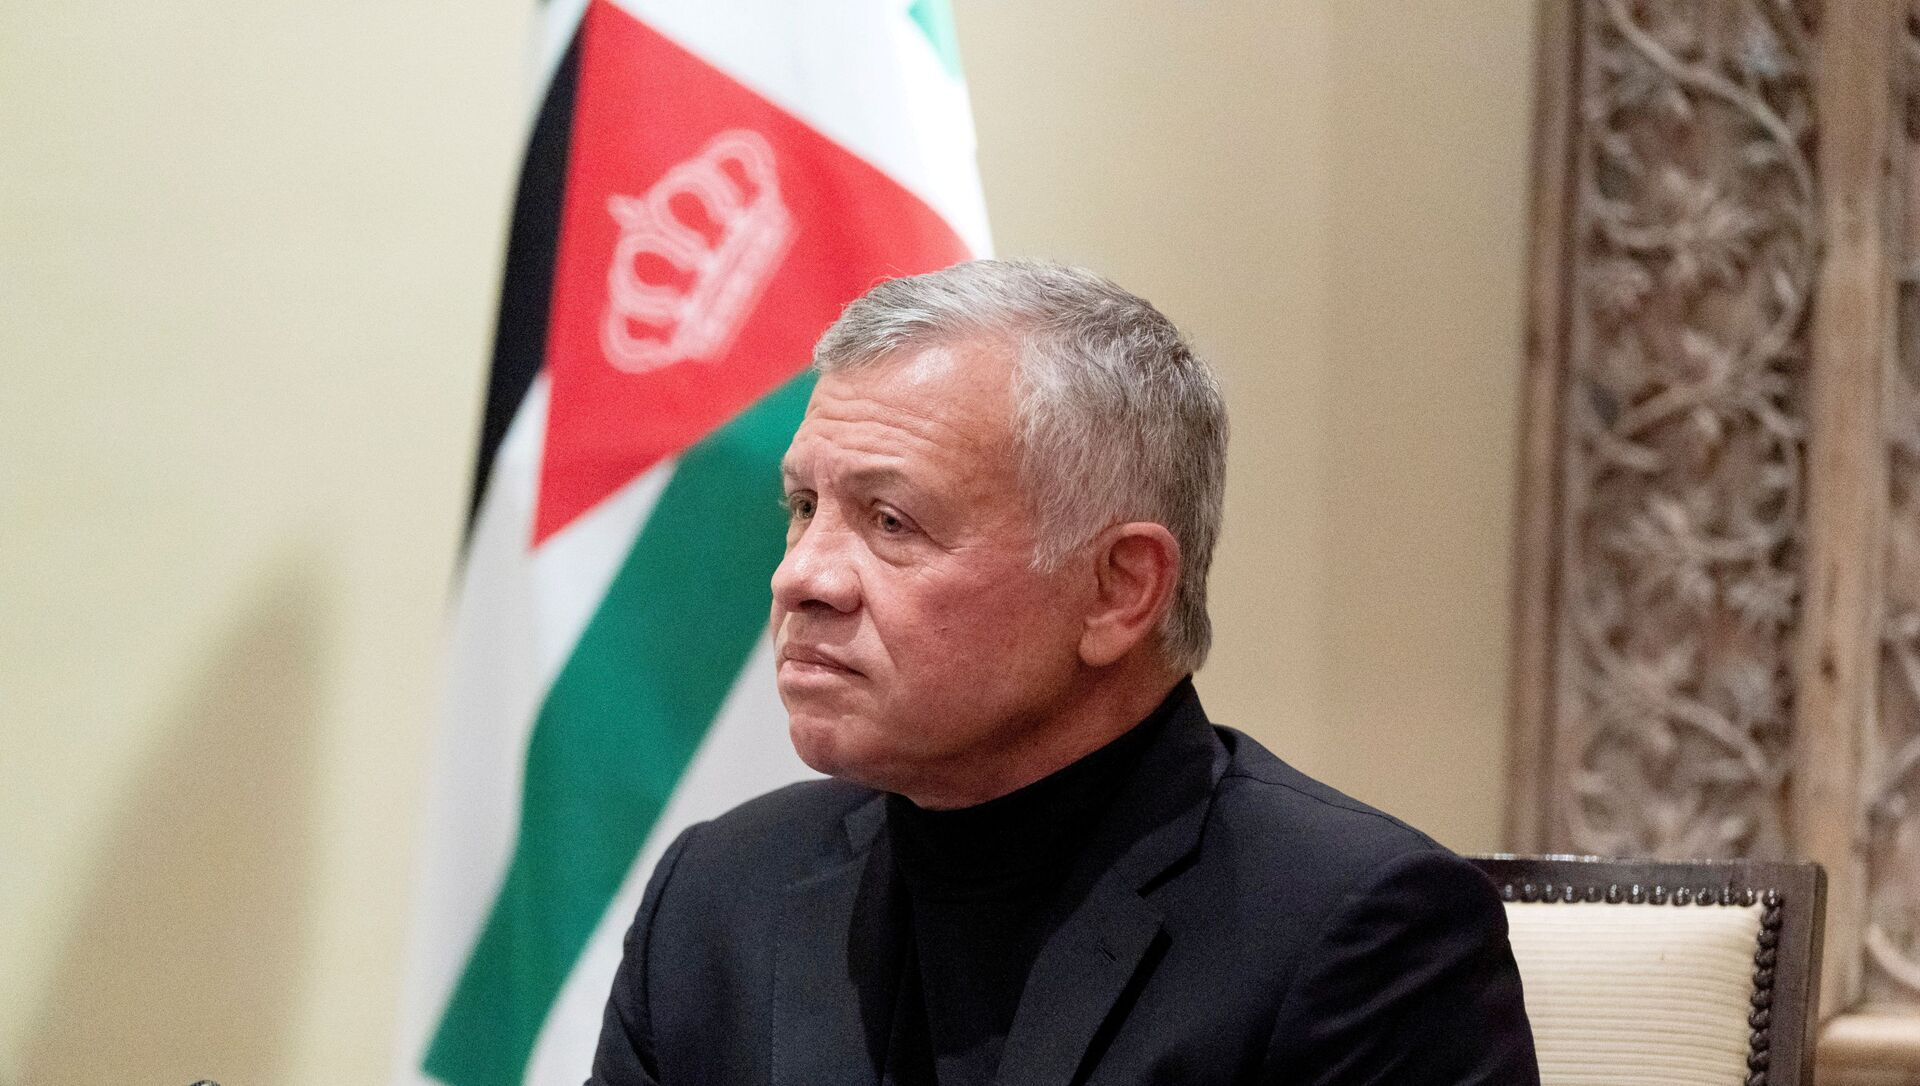 Jordan's King Abdullah II listens during a meeting in Amman, Jordan, May 26, 2021. - Sputnik International, 1920, 10.07.2021